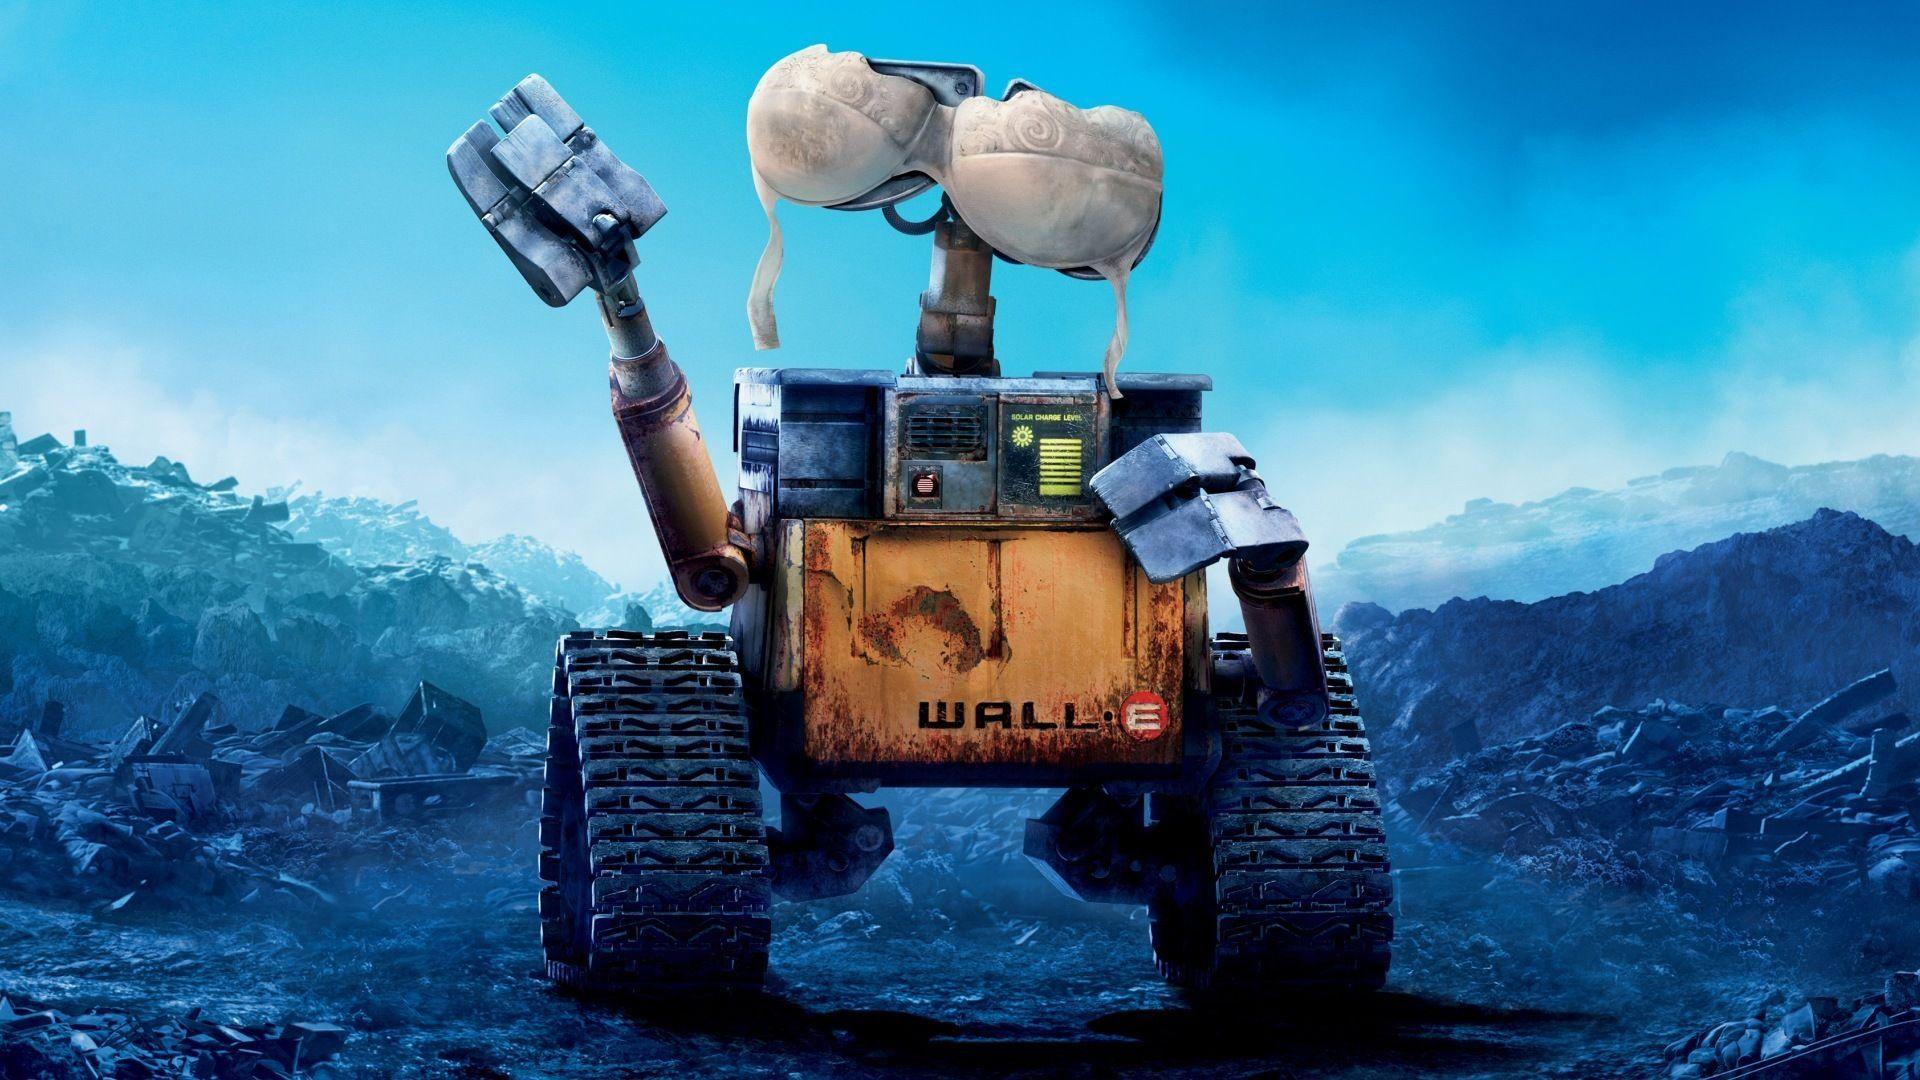 Wall E And Bra Wall E Wall E Movie Wall E Wallpaper